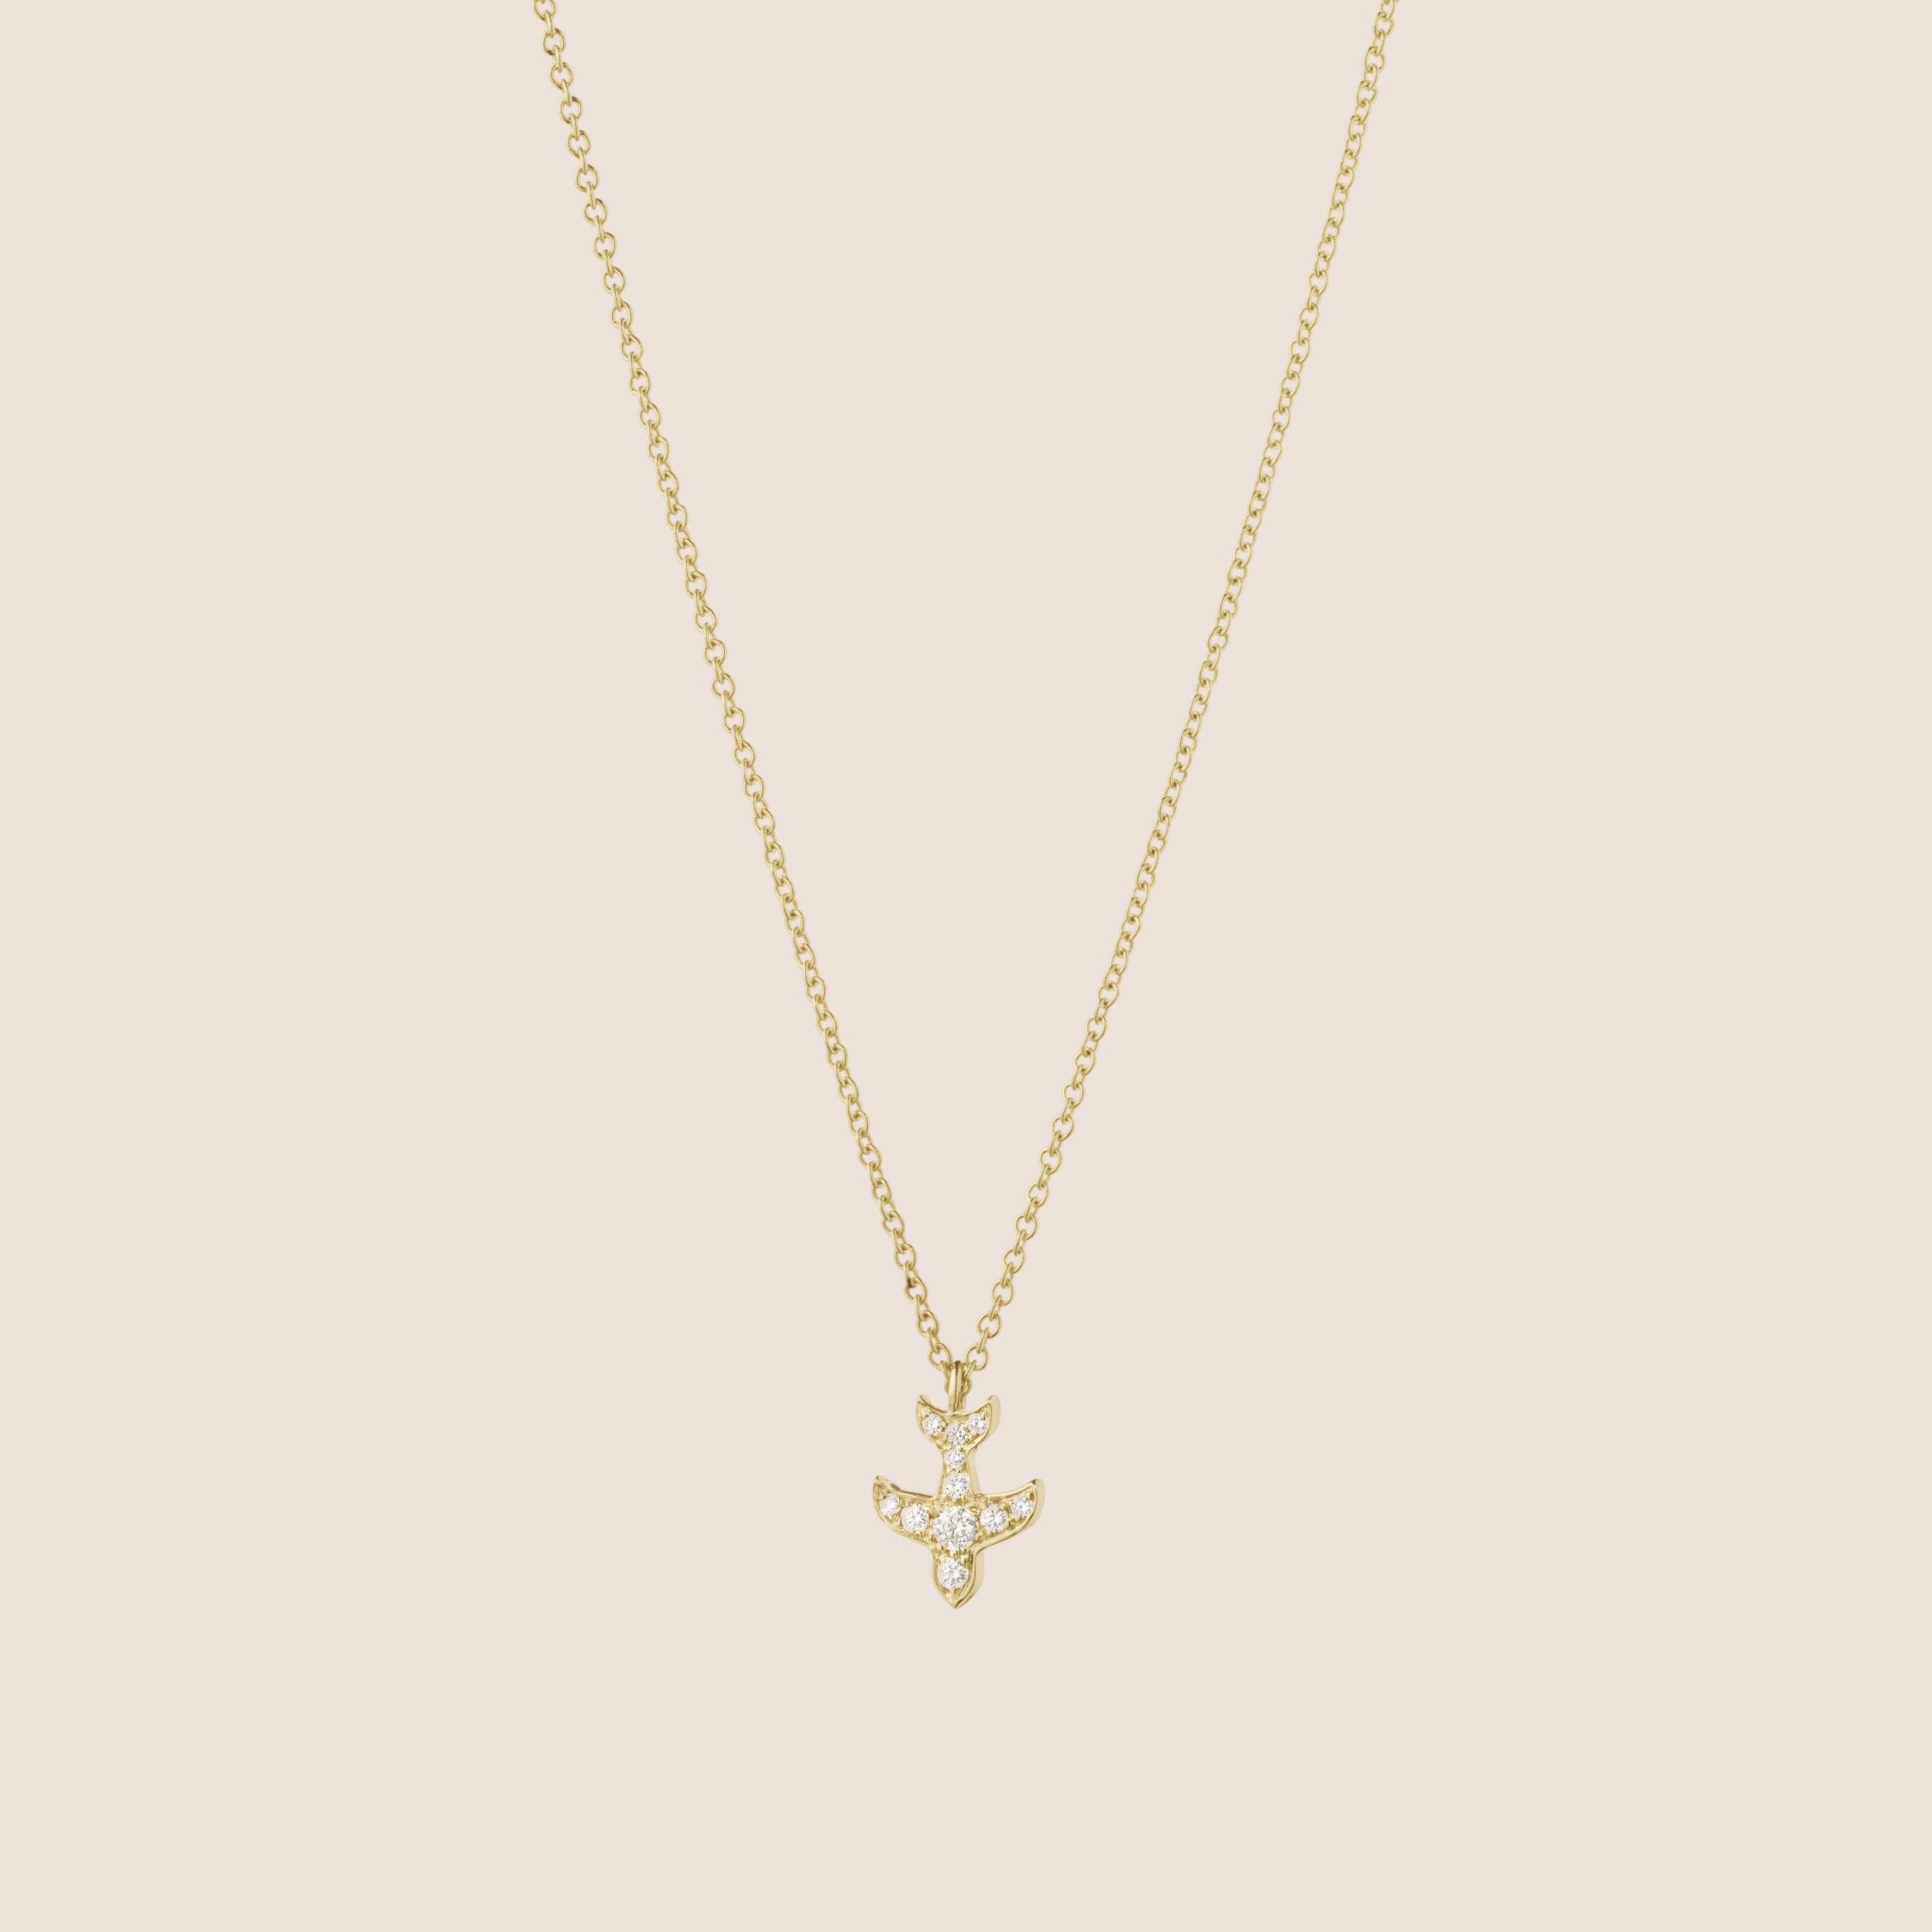 Petite Paloma Necklace